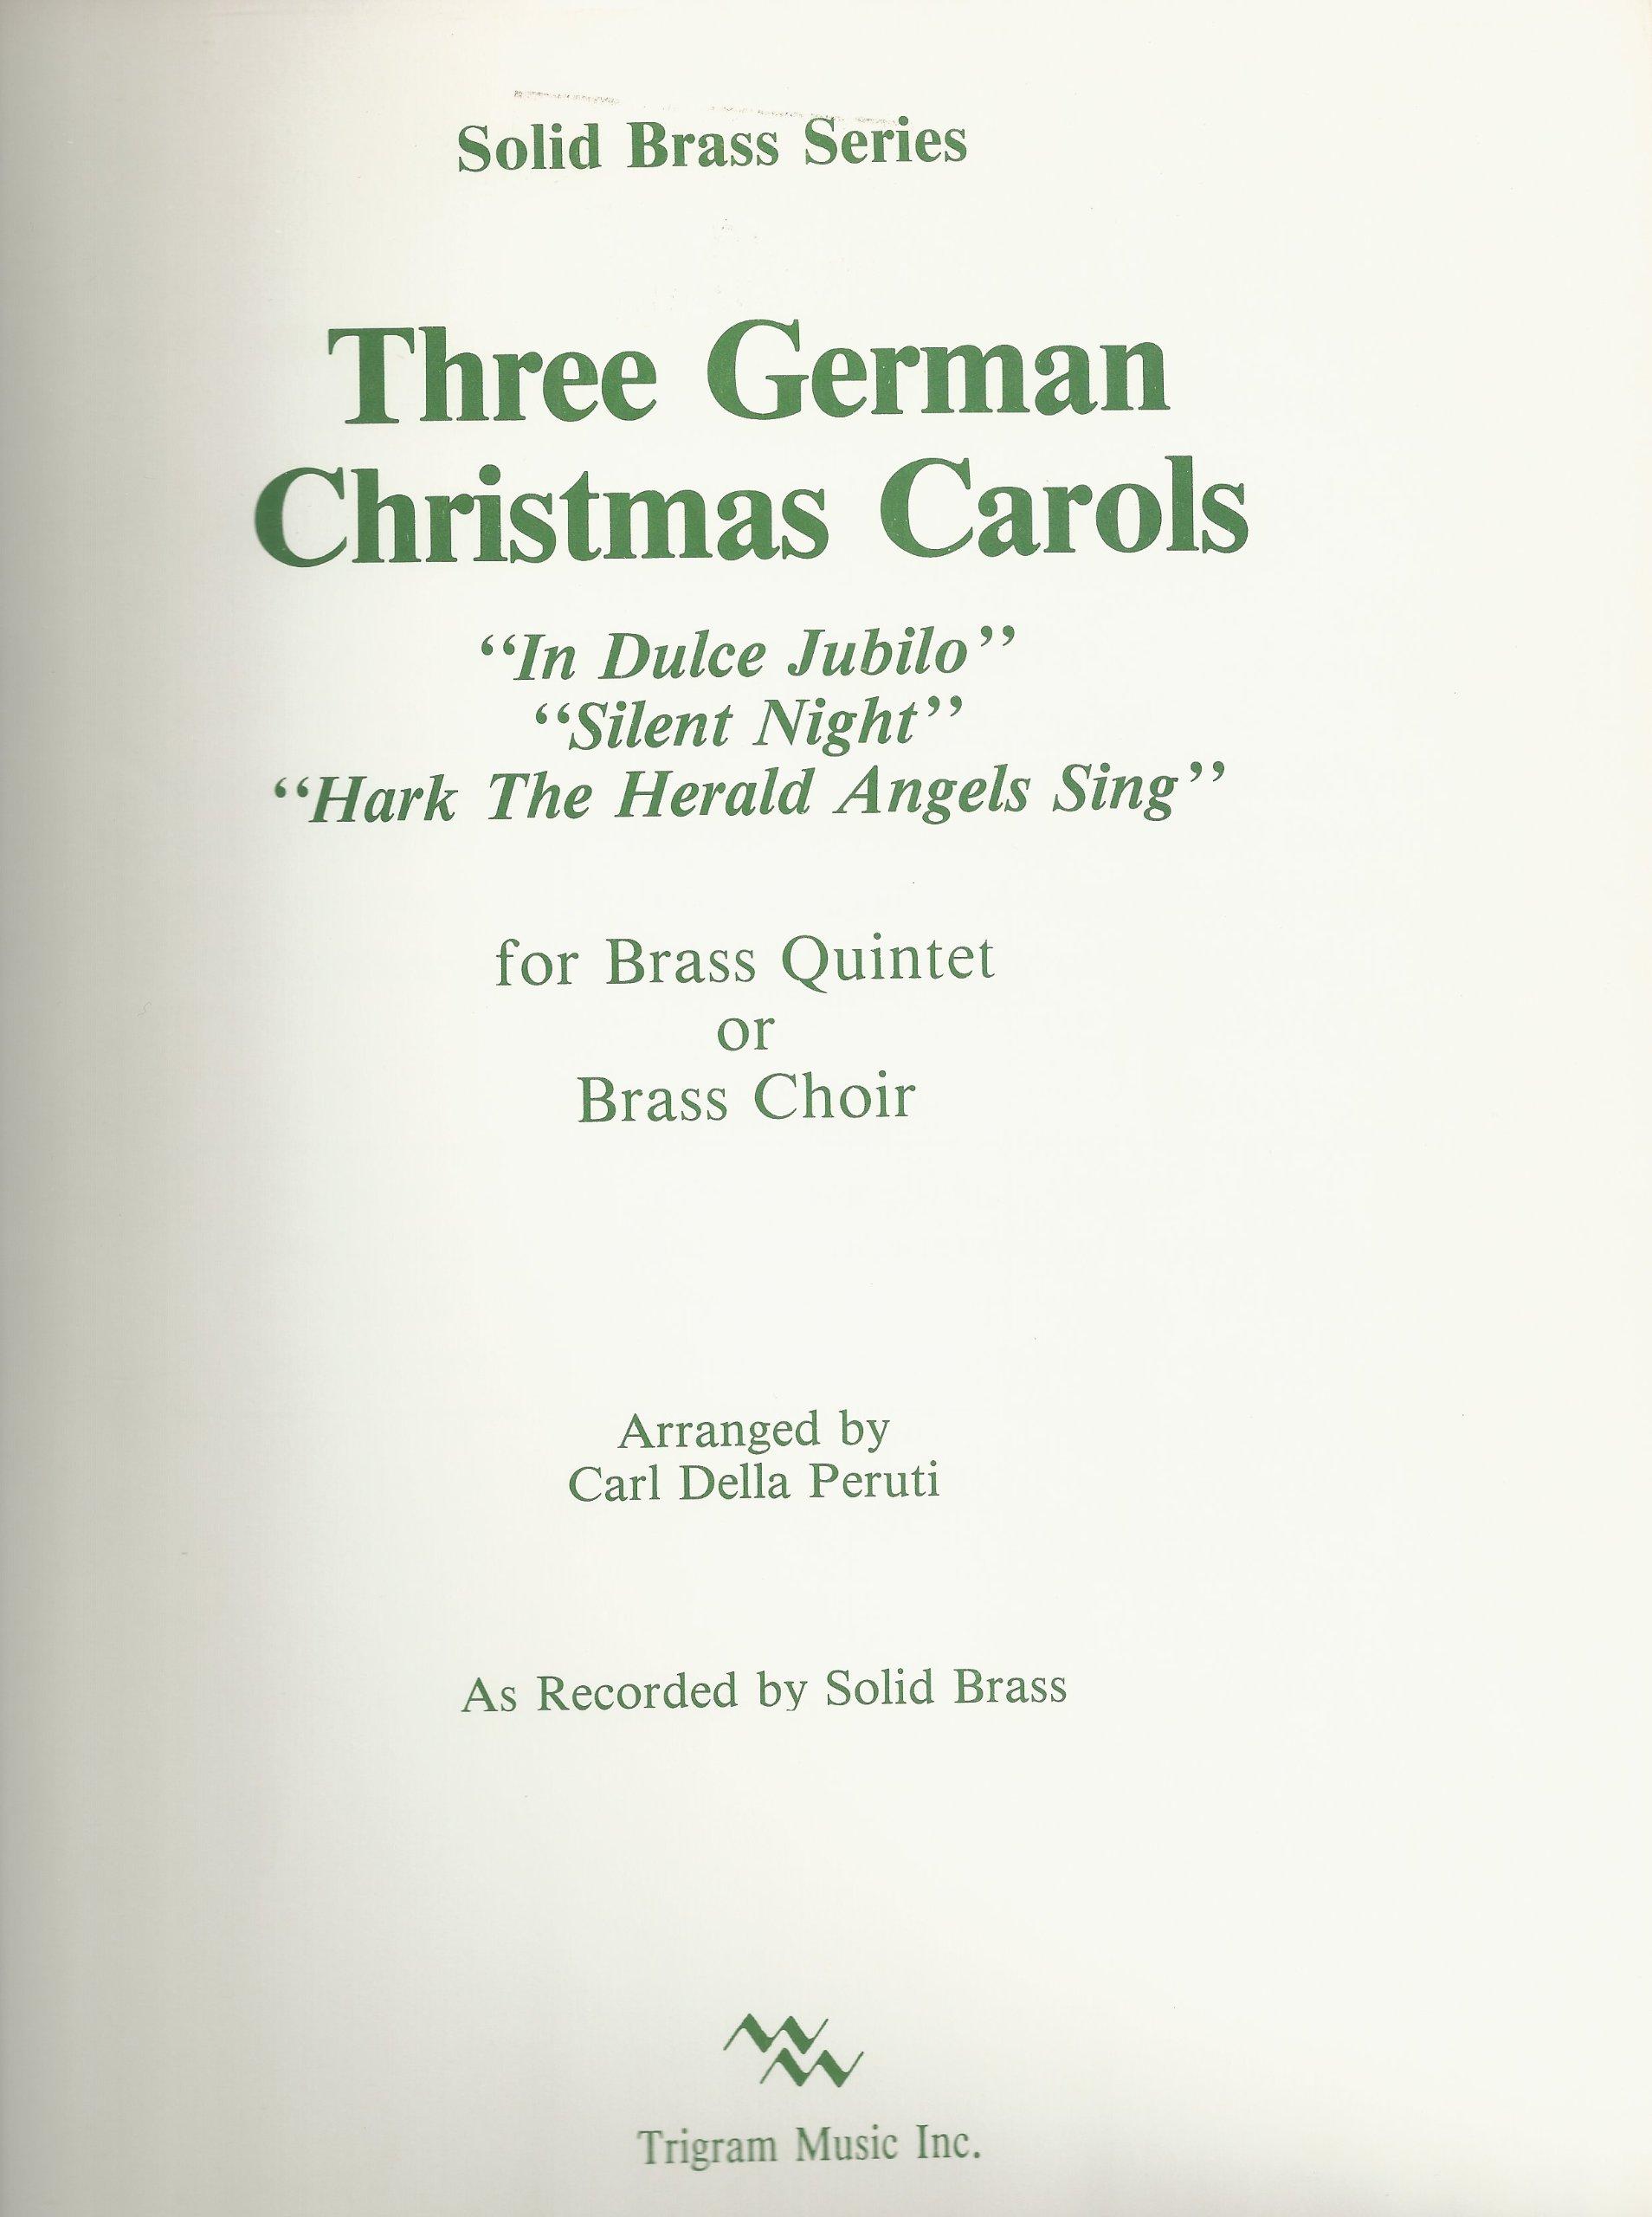 amazoncom three german christmas carols for brass quintet or brass choir solid brass series arranged by carl della peruti books